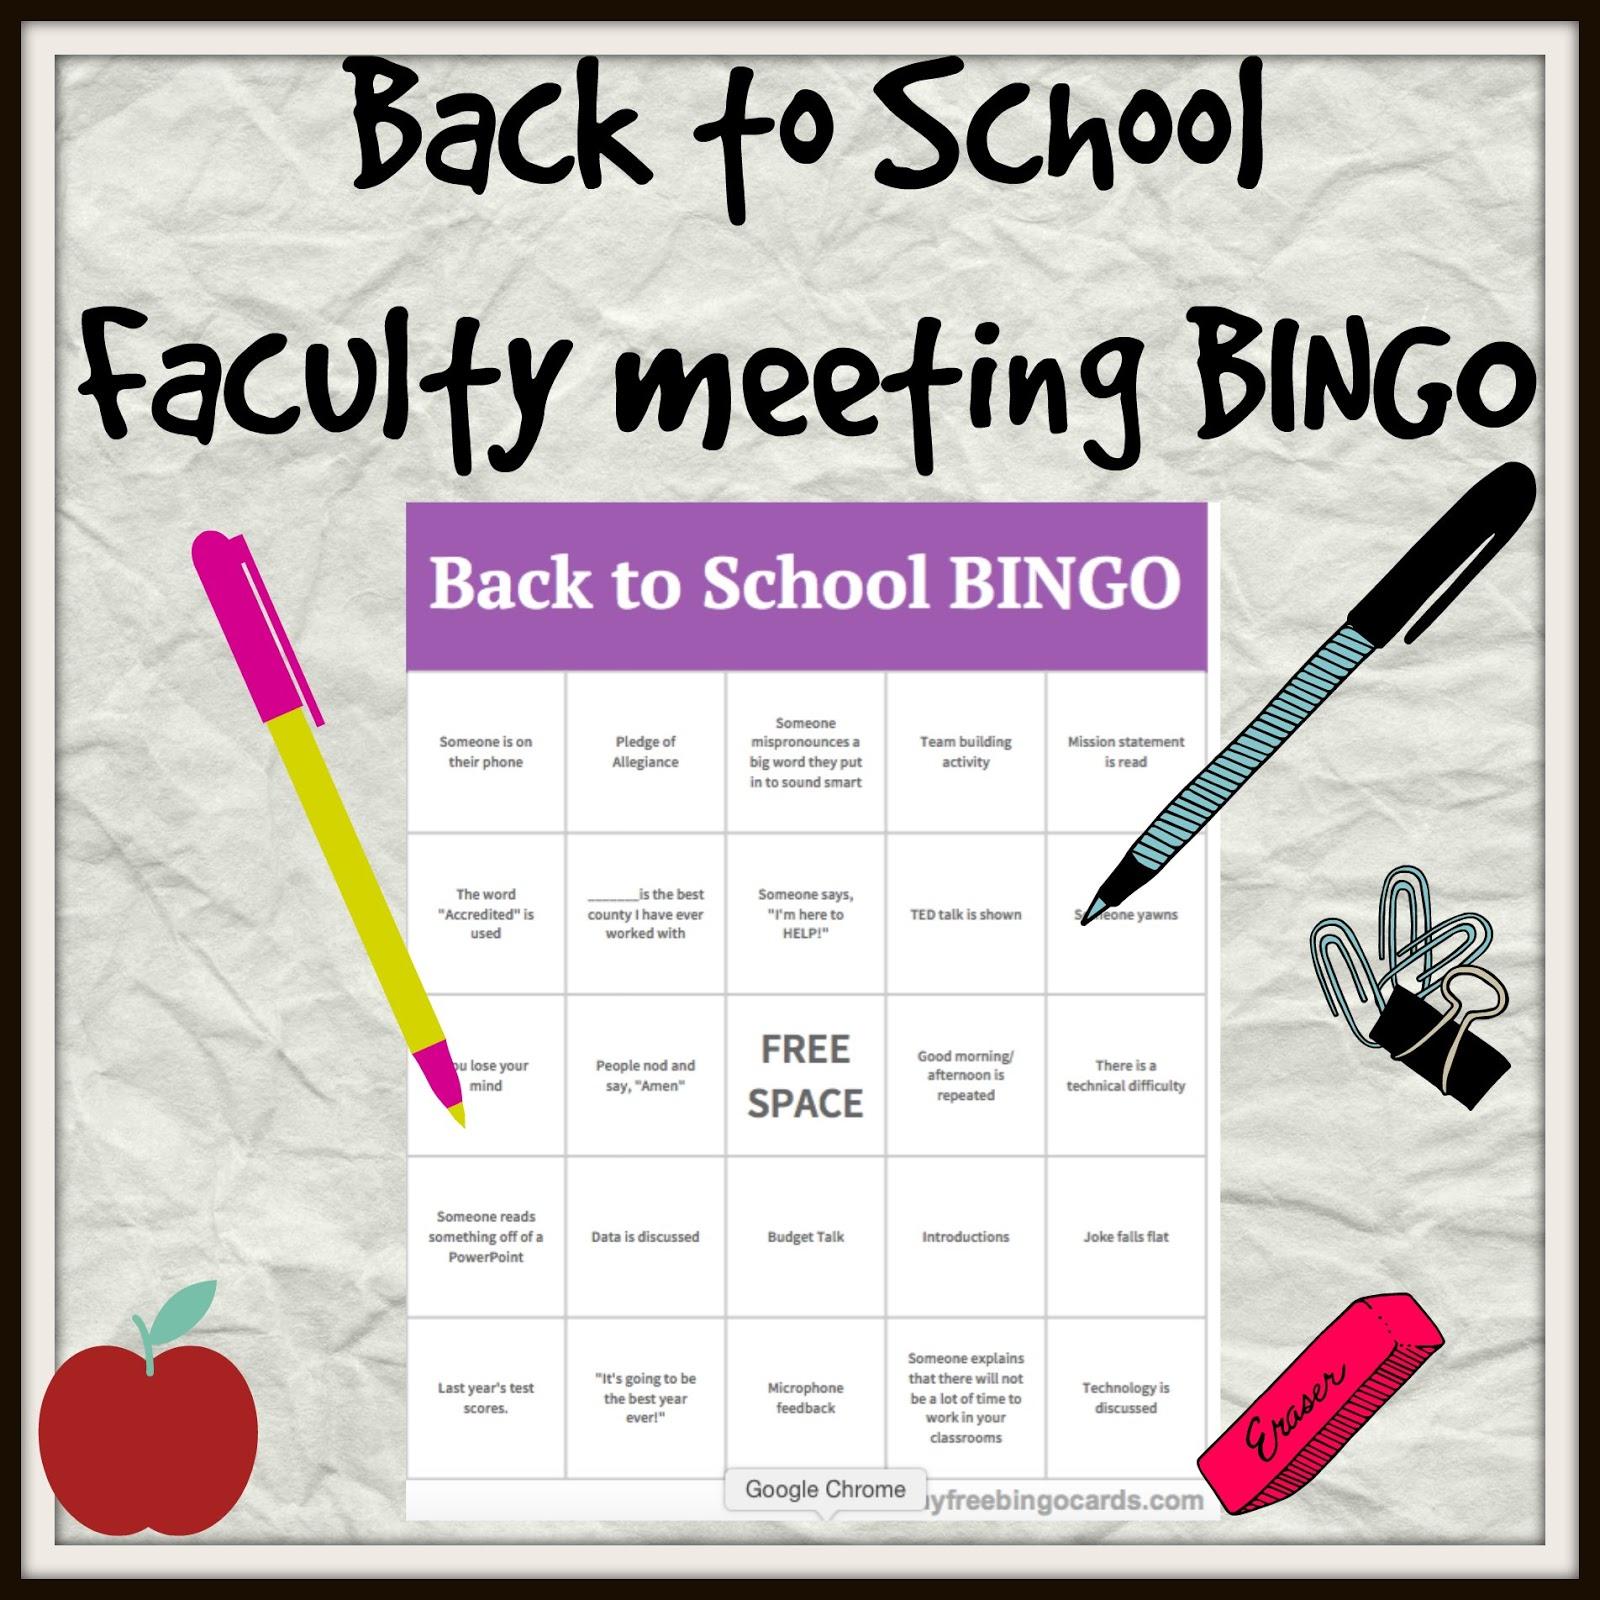 Faculty Meeting Back To School Bingo